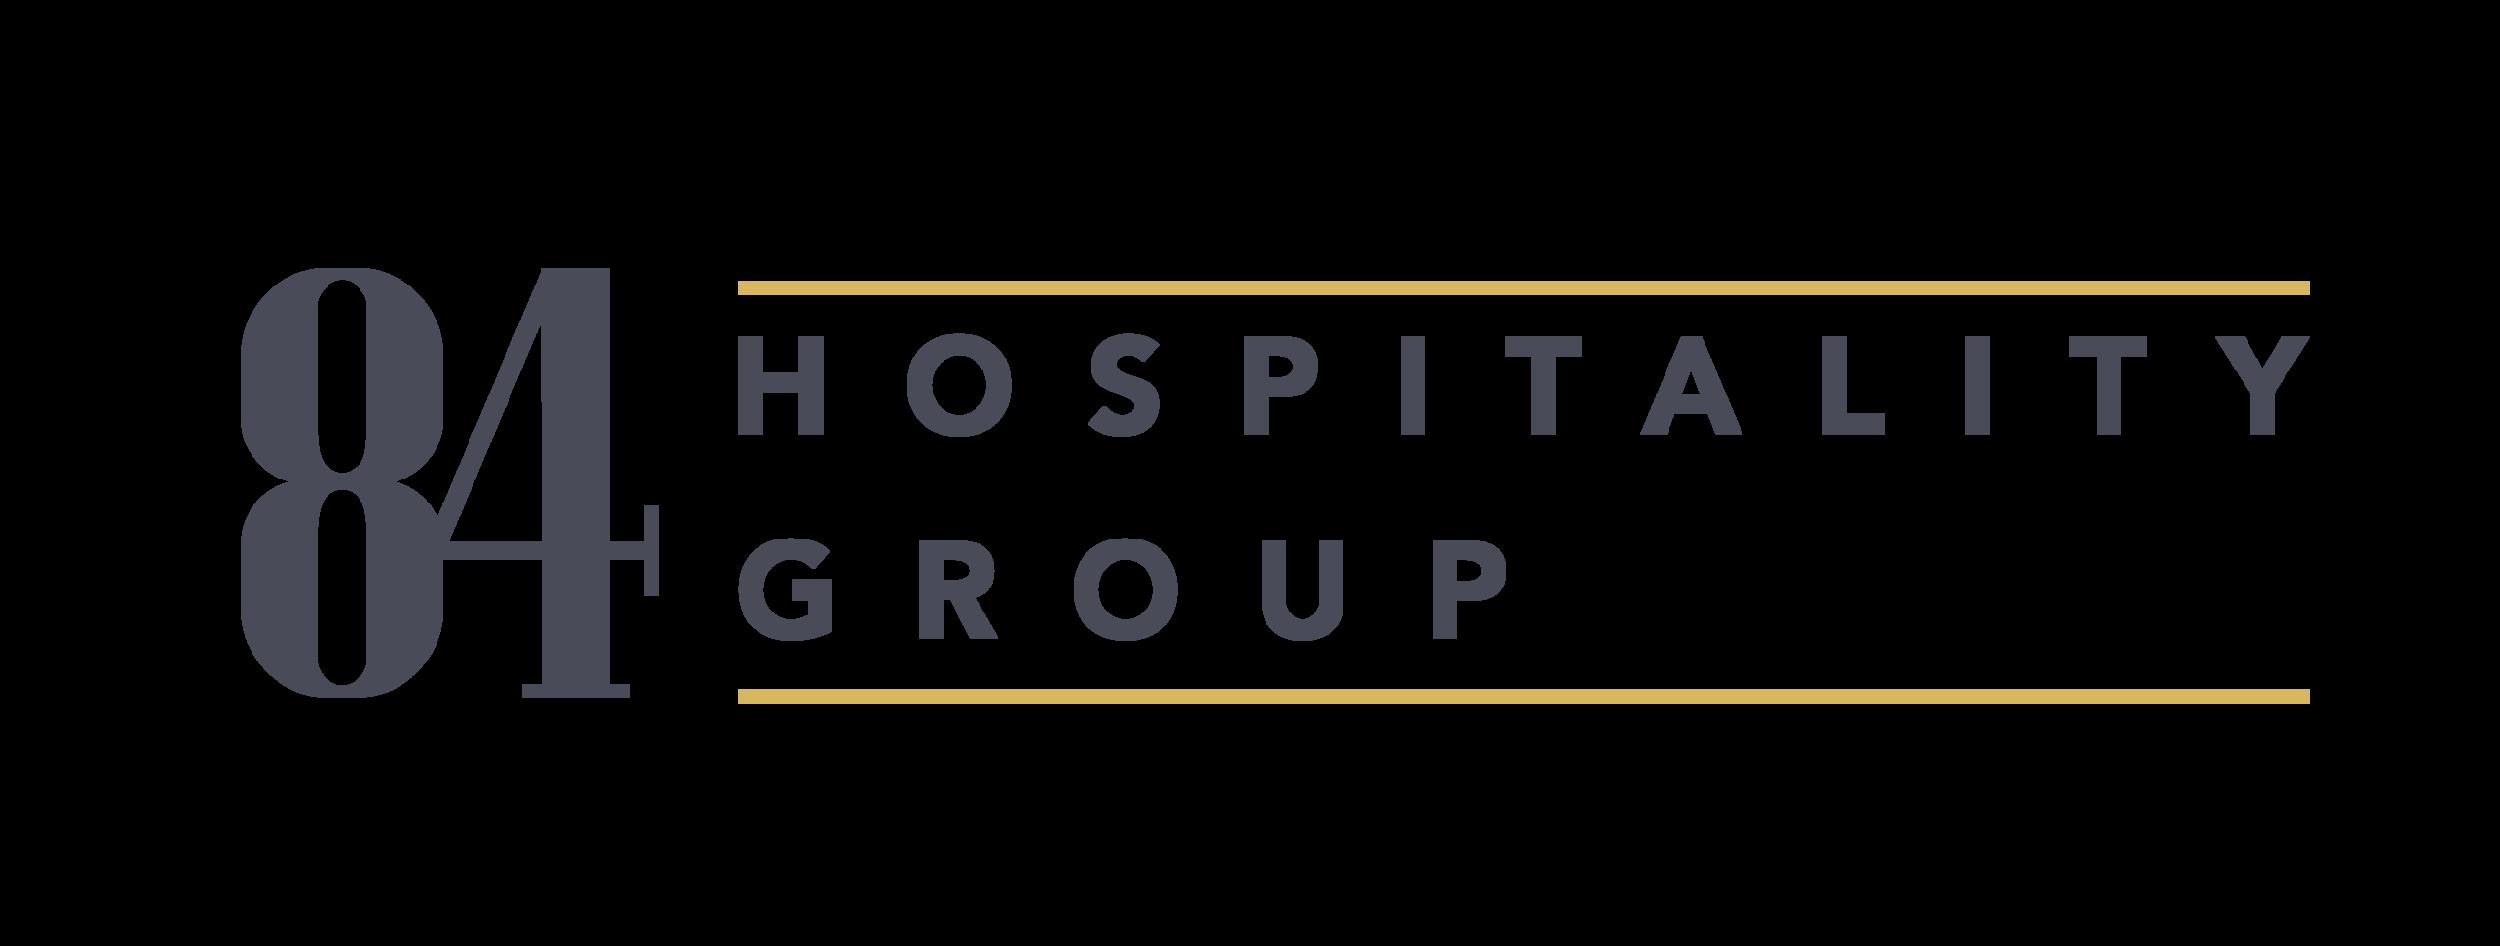 84 Hospitality Group